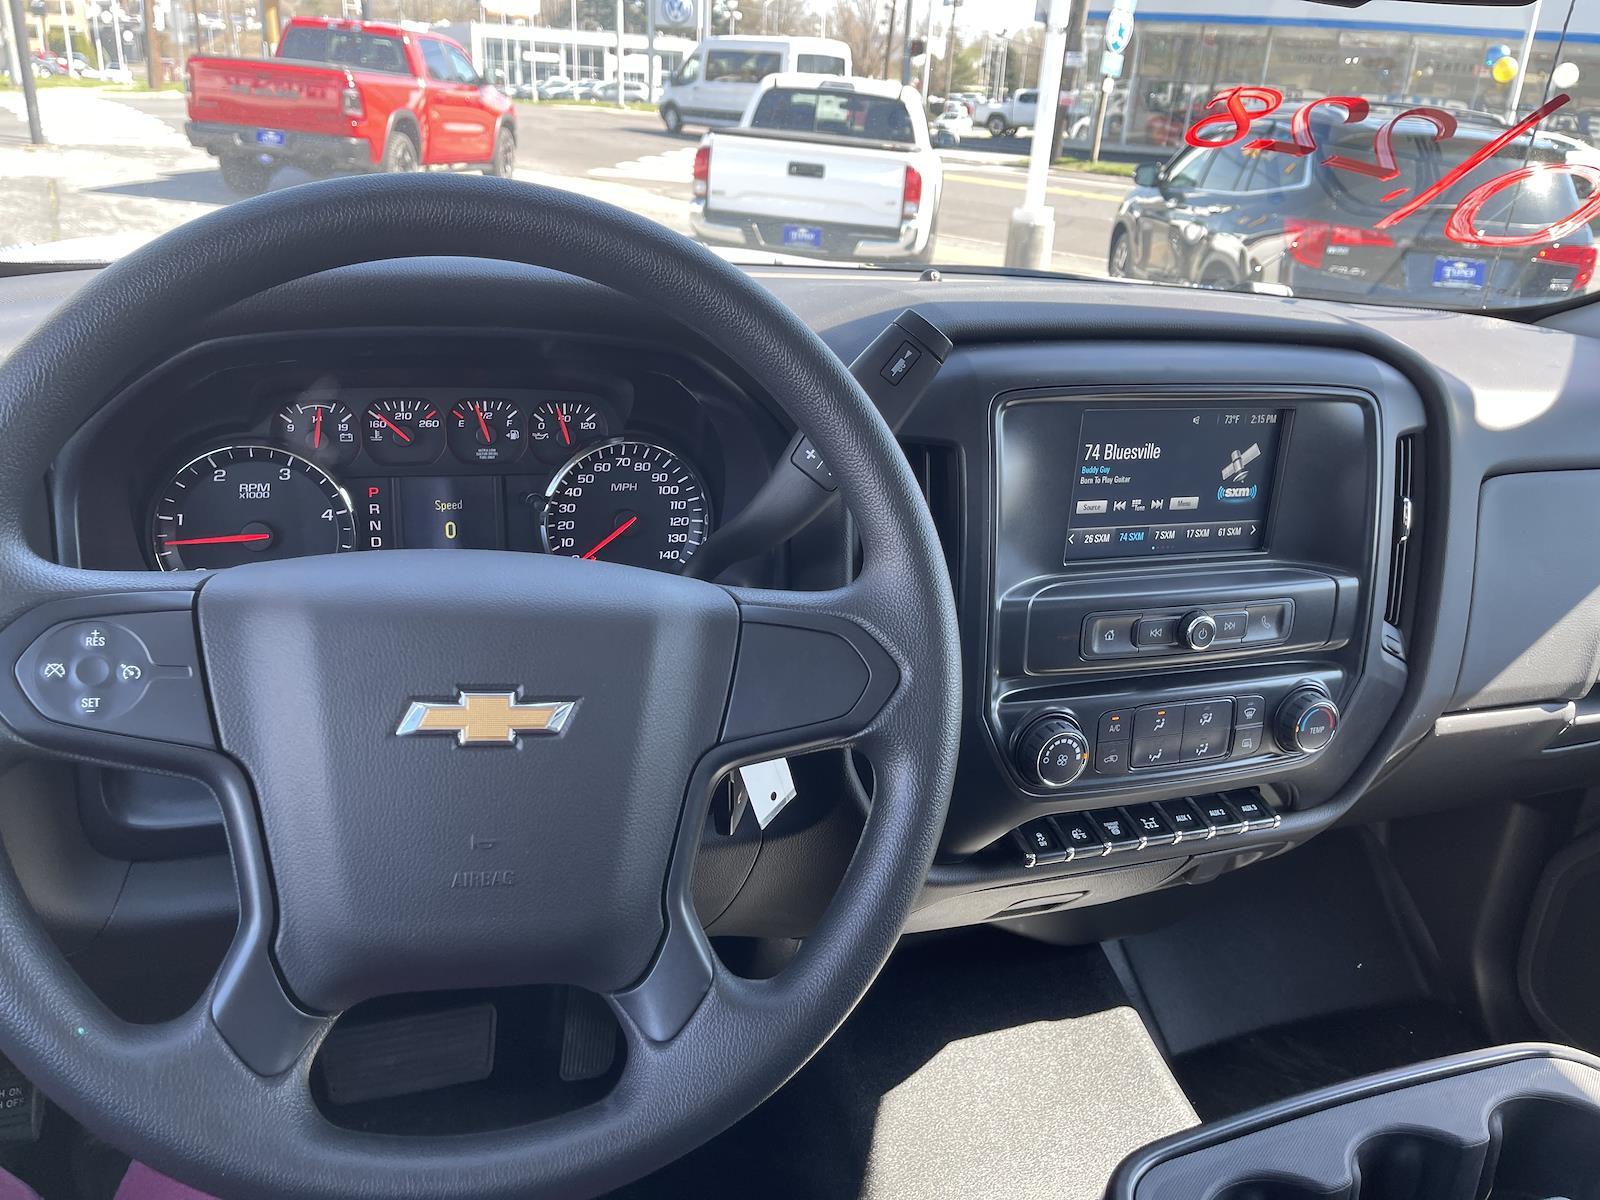 2020 Chevrolet Silverado 4500 Regular Cab DRW 4x2, Mike's Truck Service and Sales Inc. Contractor Body #205978 - photo 3